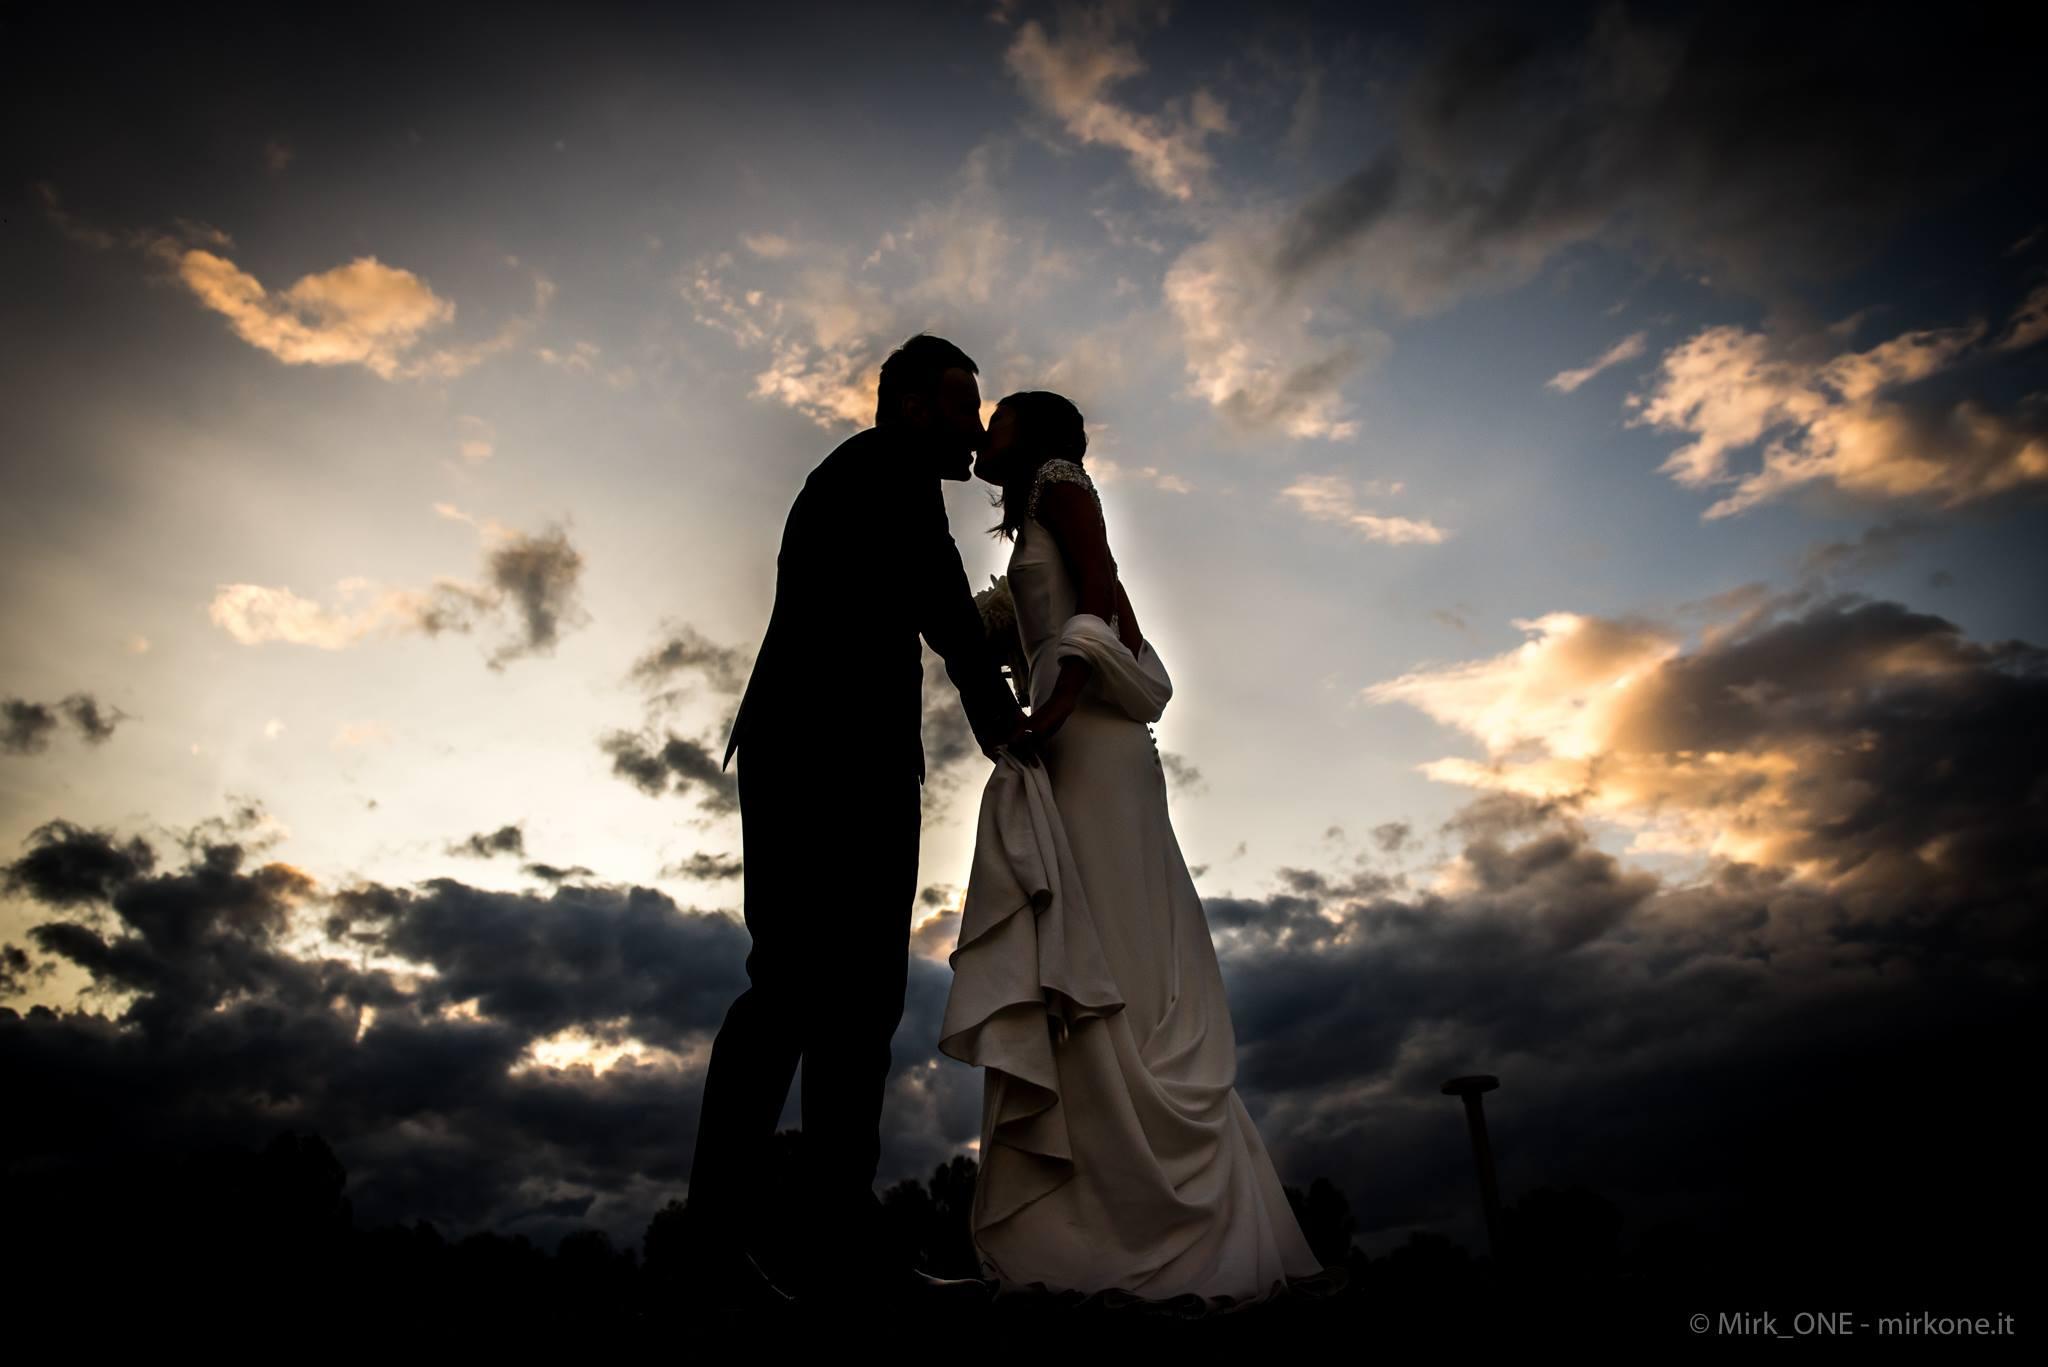 https://lnx.mirkone.it/wp-content/uploads/2015/07/mirk_ONE-fotografo-matrimonio-00117.jpg